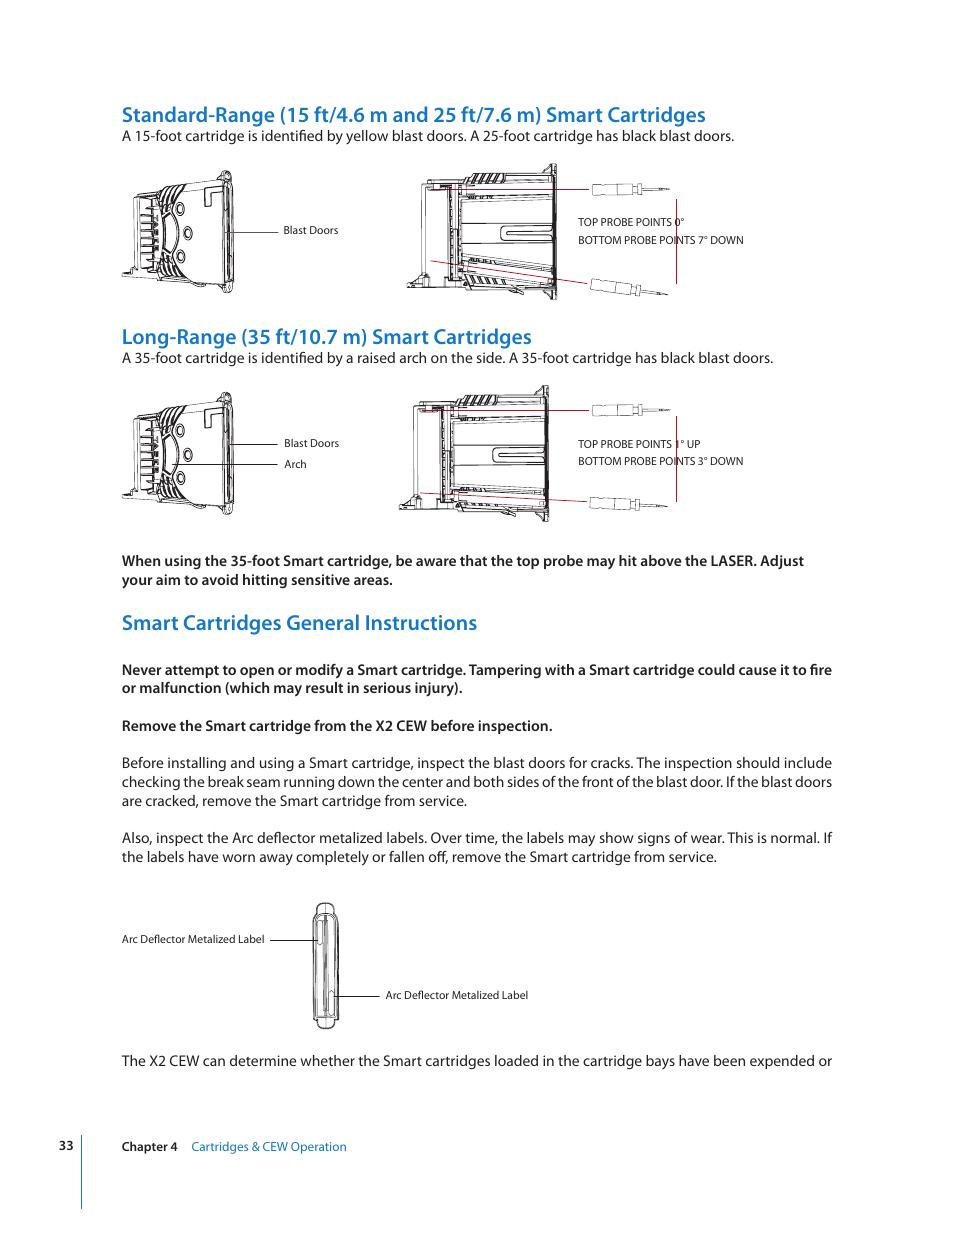 Husqvarna Rz Charging Wiring Diagrams on